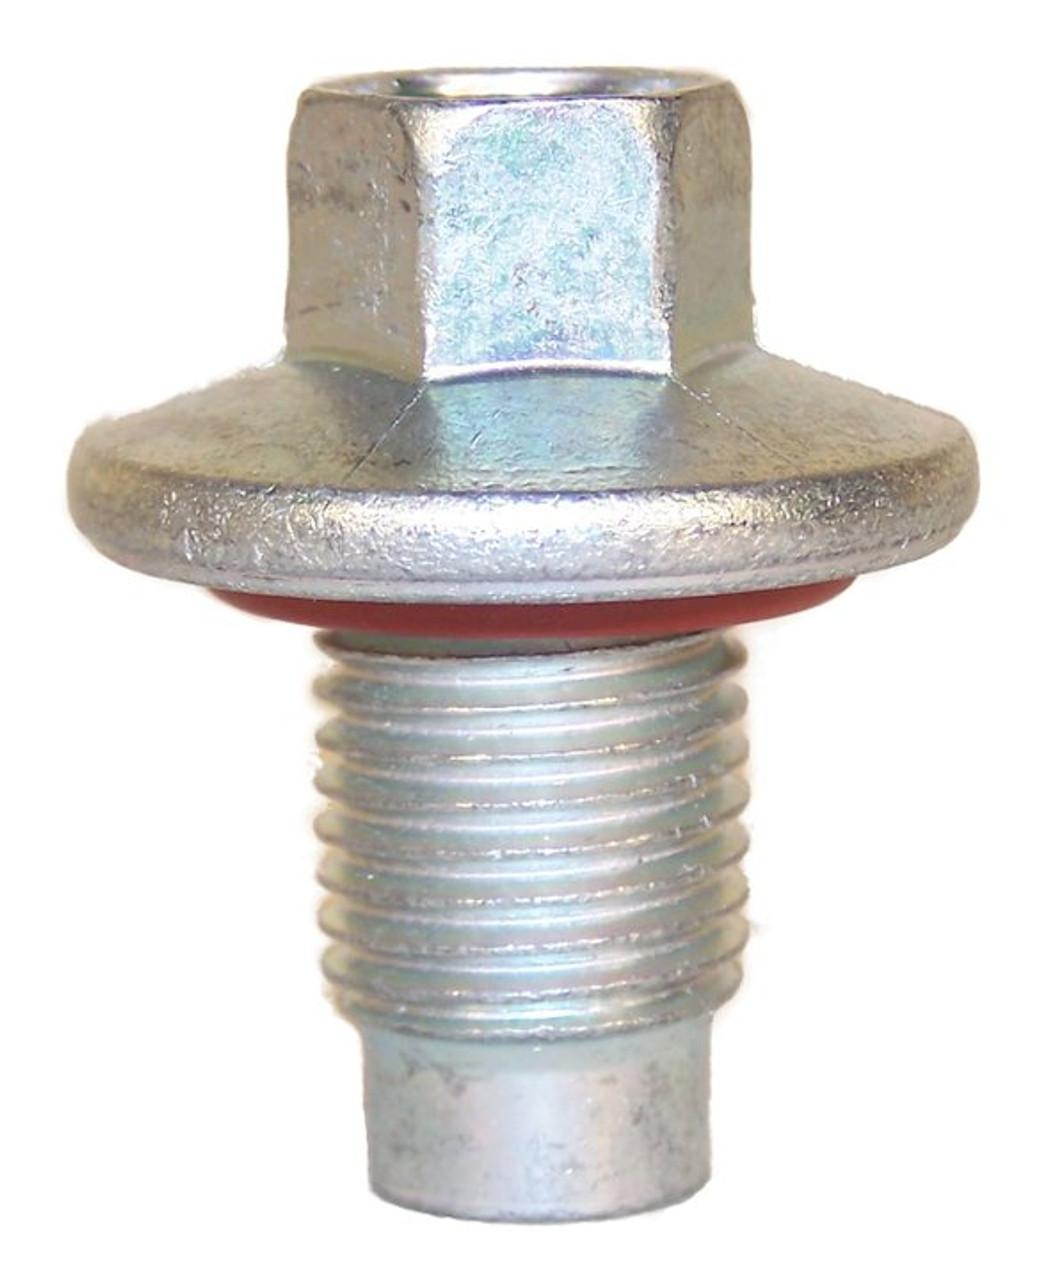 2004 dodge ram oil drain plug